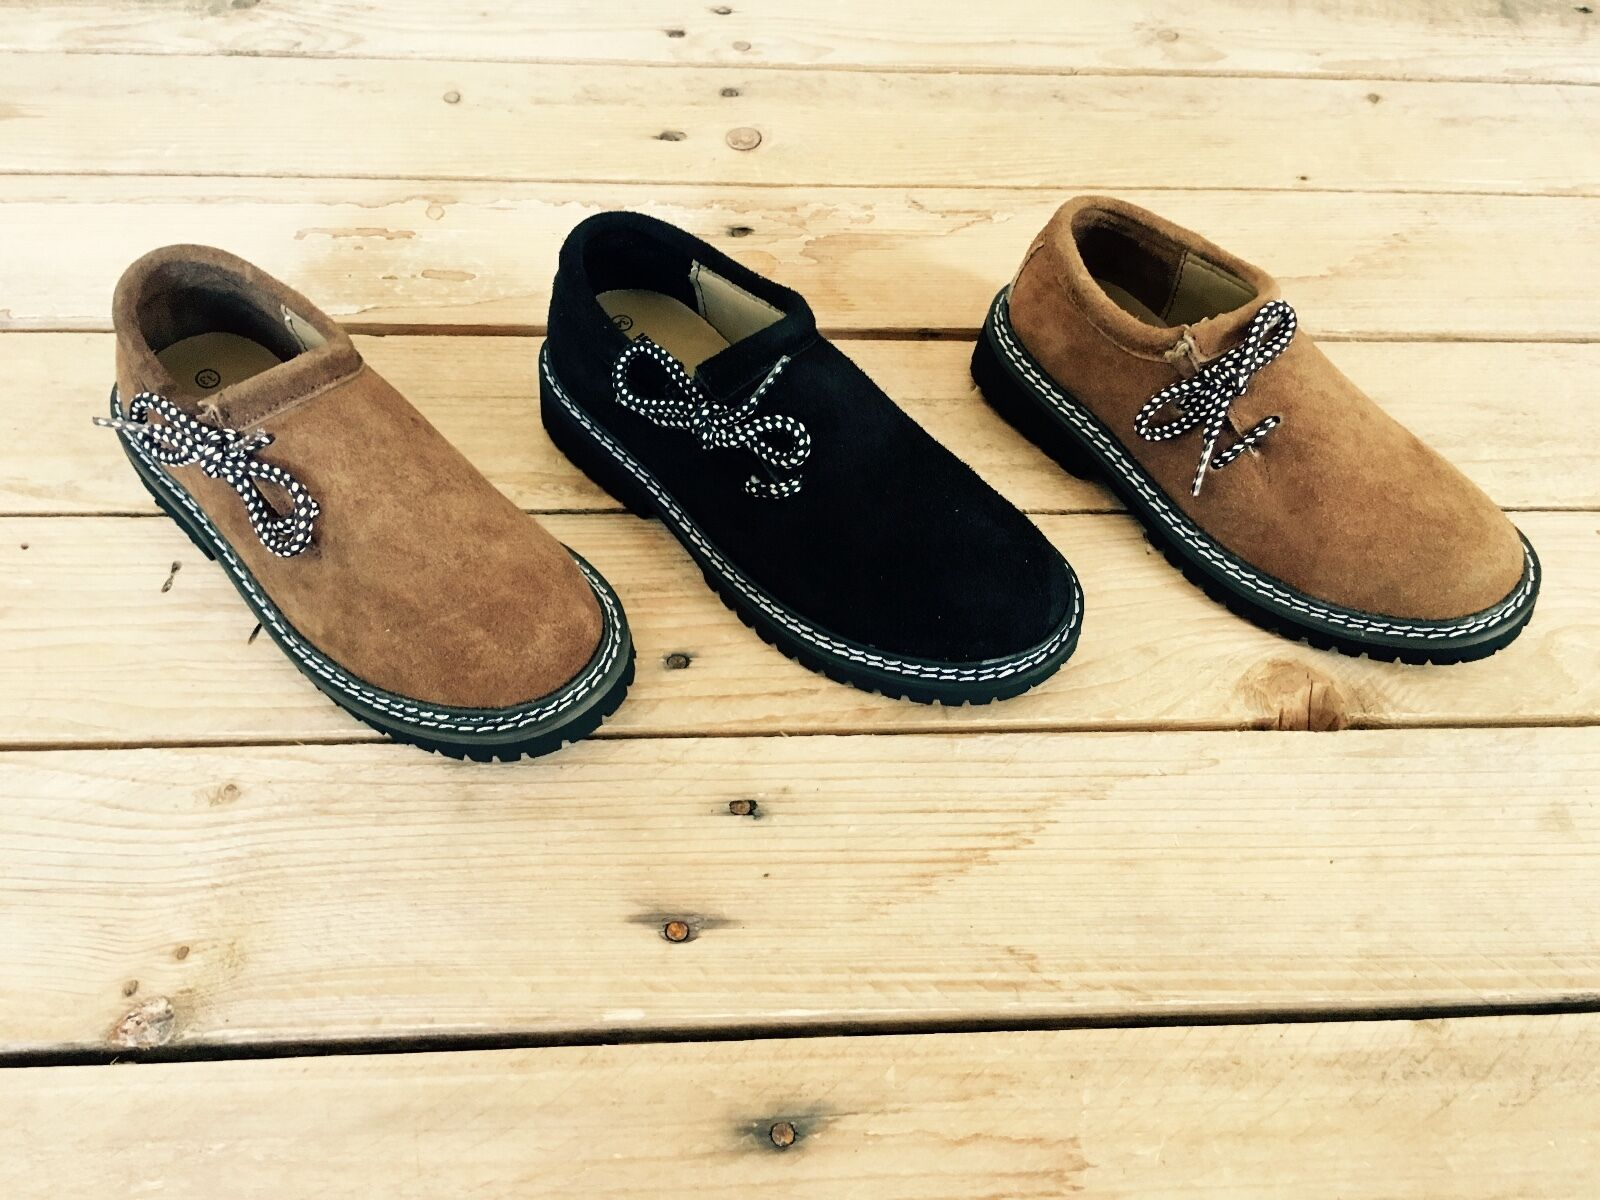 Großhandel Schuhe Zur Lederhose Kinder Test Vergleich +++